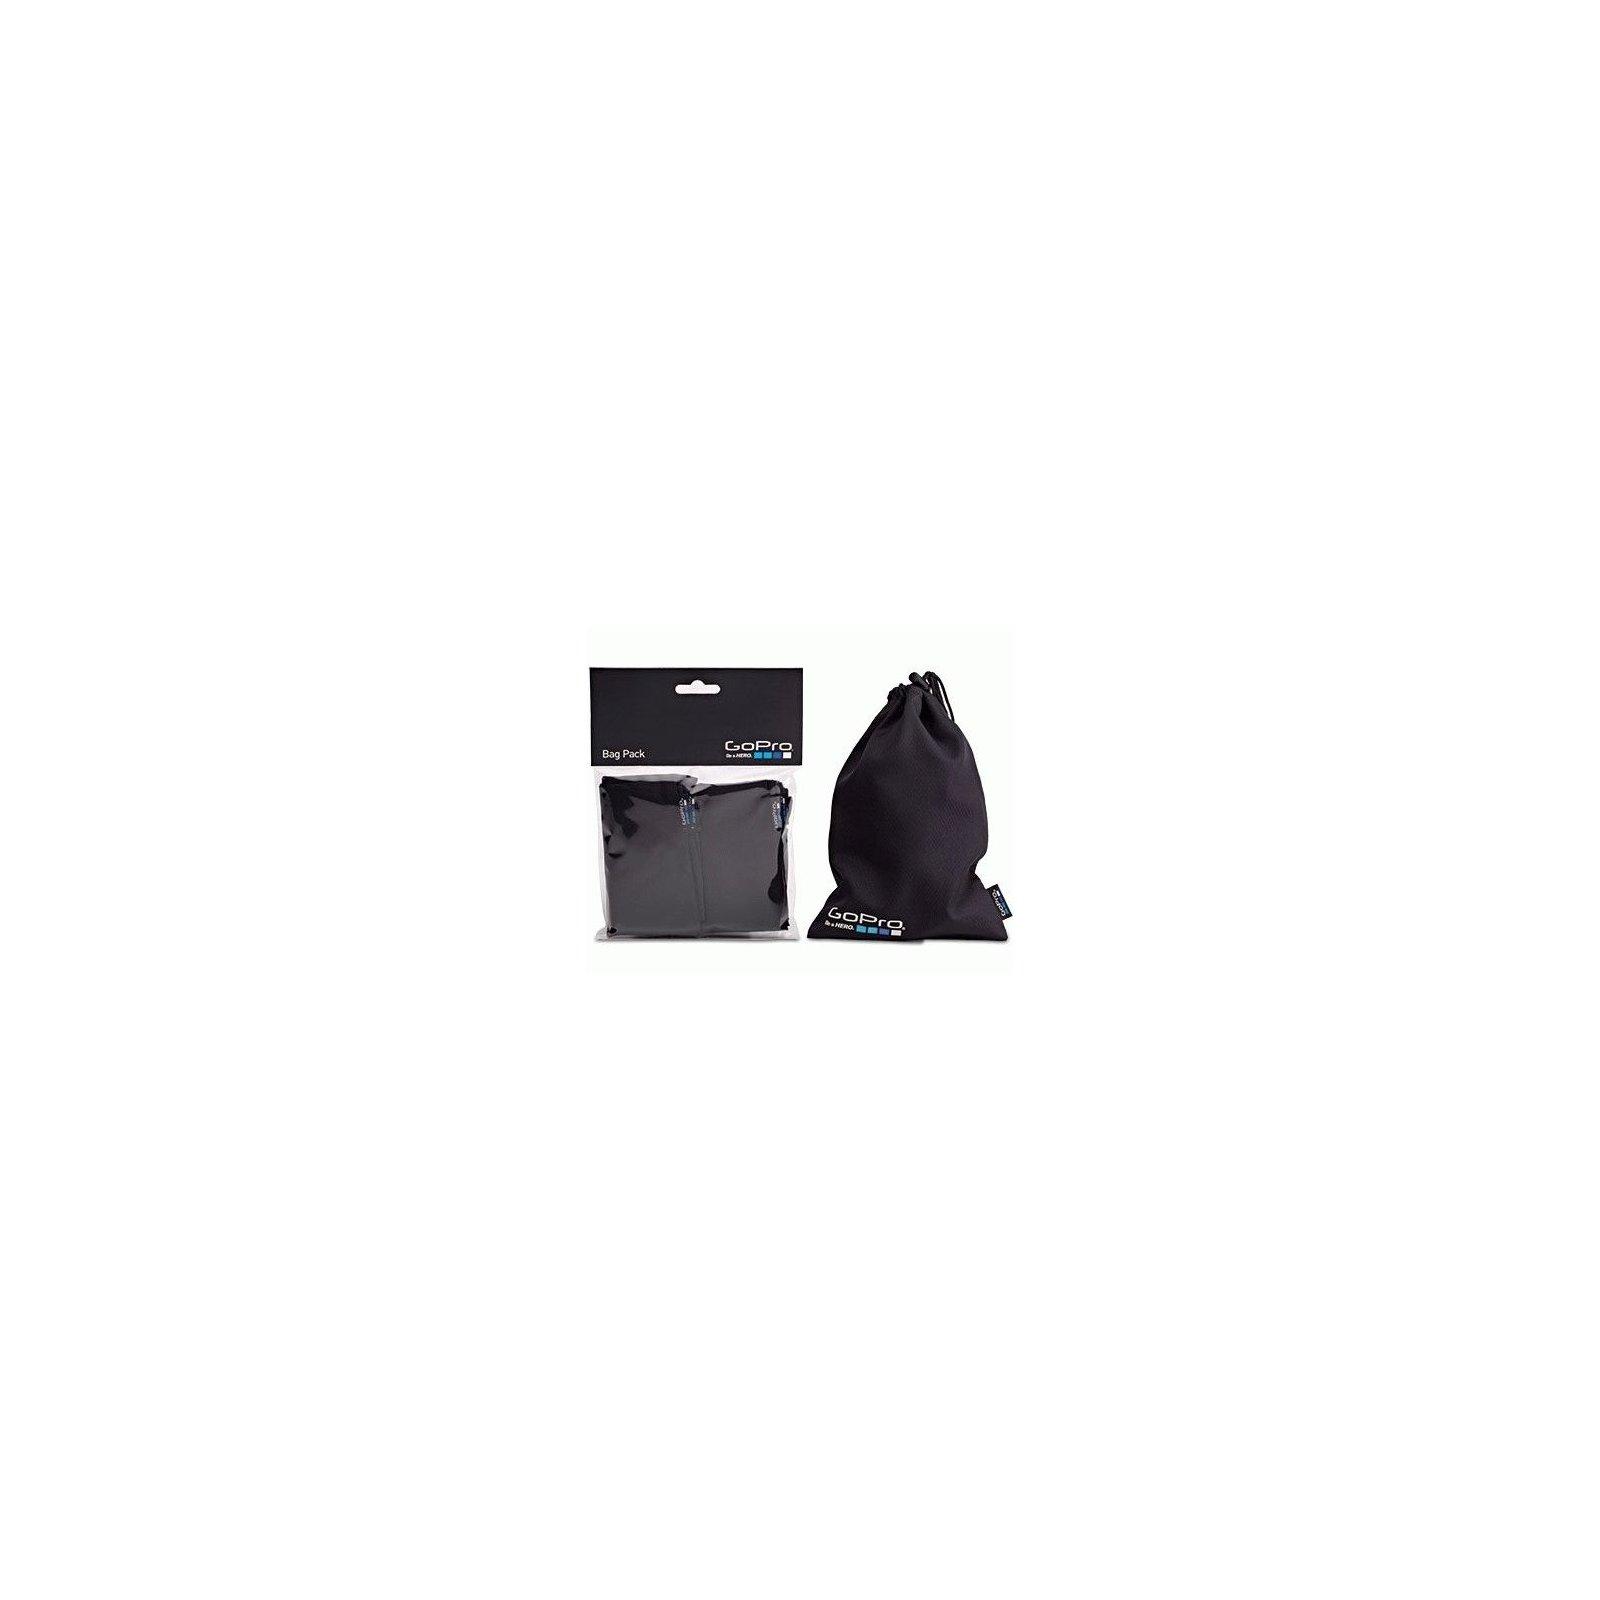 Аксессуар к экшн-камерам GoPro Bag Black (ABGPK-005)